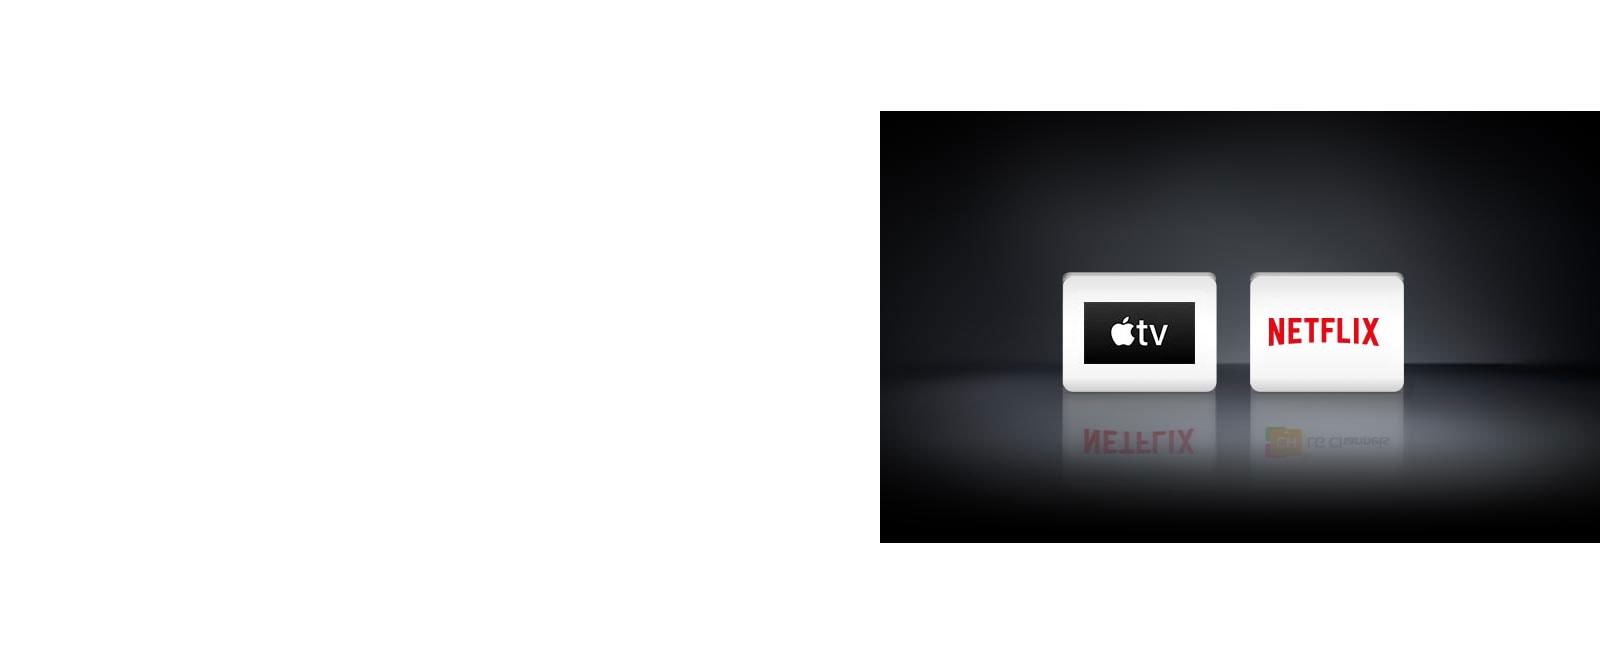 Two logos: The Apple TV app, Netflix